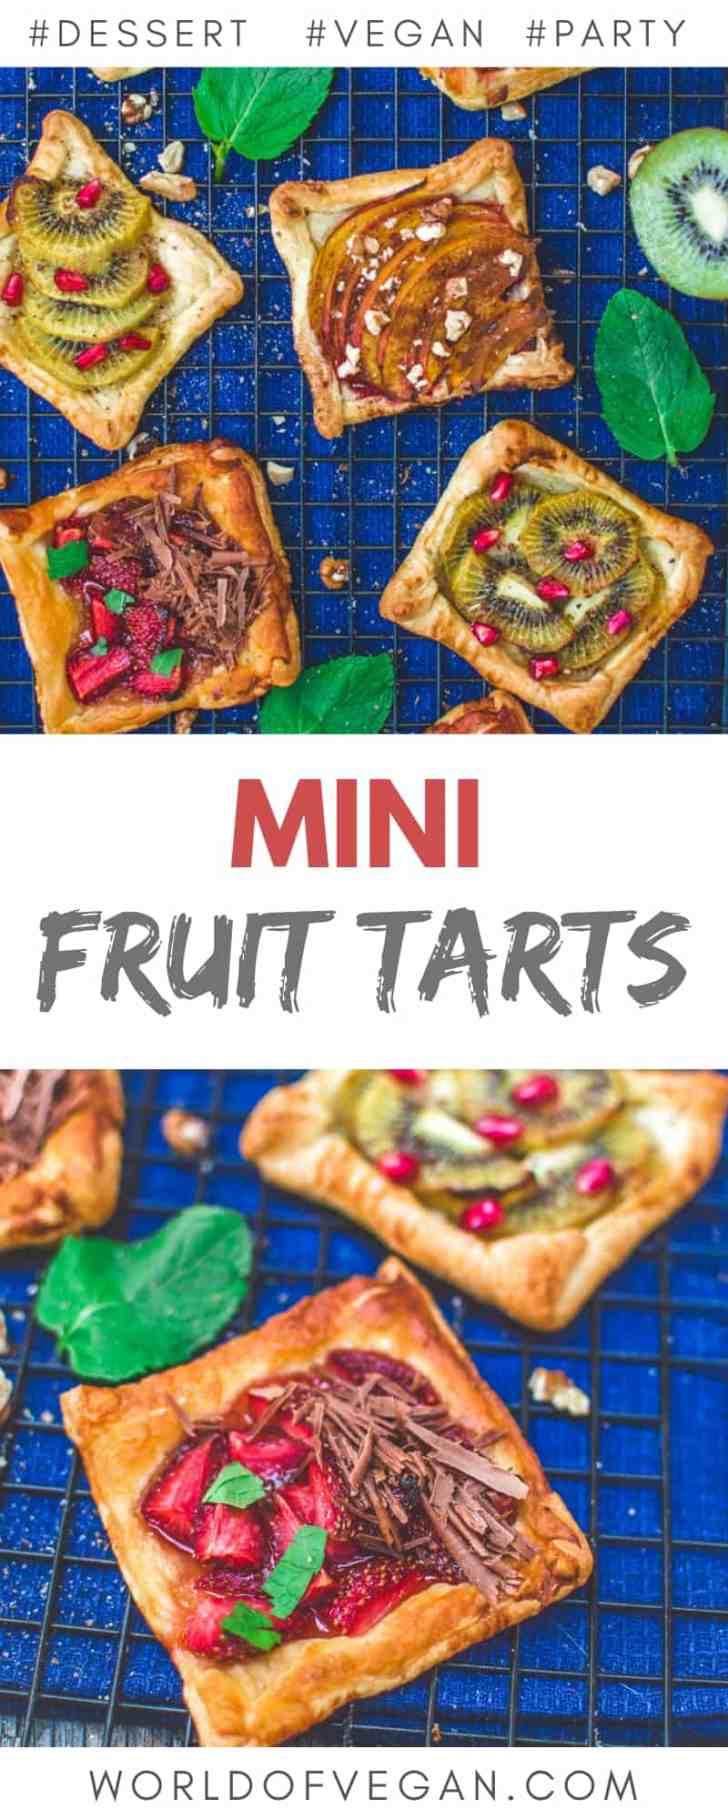 Mini Vegan Fruit Tarts | Easy Dessert Recipe | World of Vegan | #vegan #tarts #fruits #fruits #dessert #worldofvegan